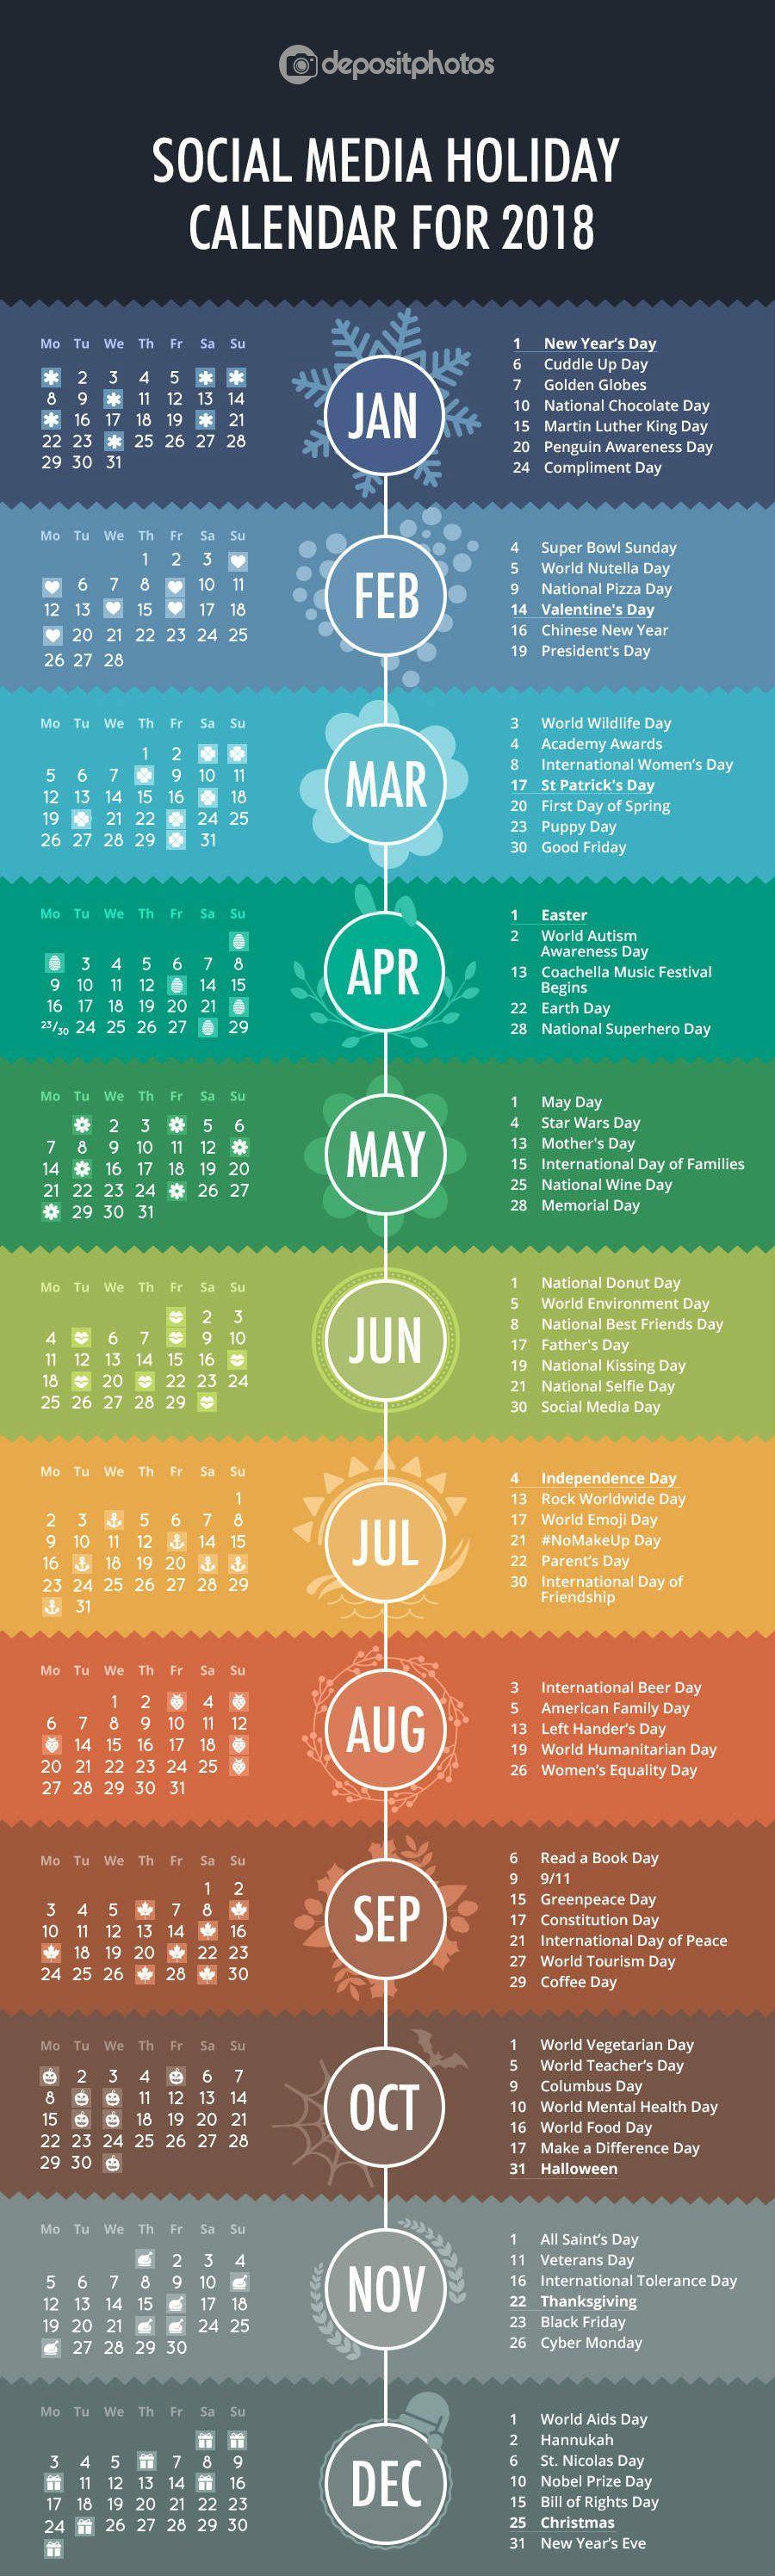 The 2018 Holiday & Event Calendar Every Social Media Marketer Needs [Infographic]   Juan Ornelas Vilches   LinkedIn